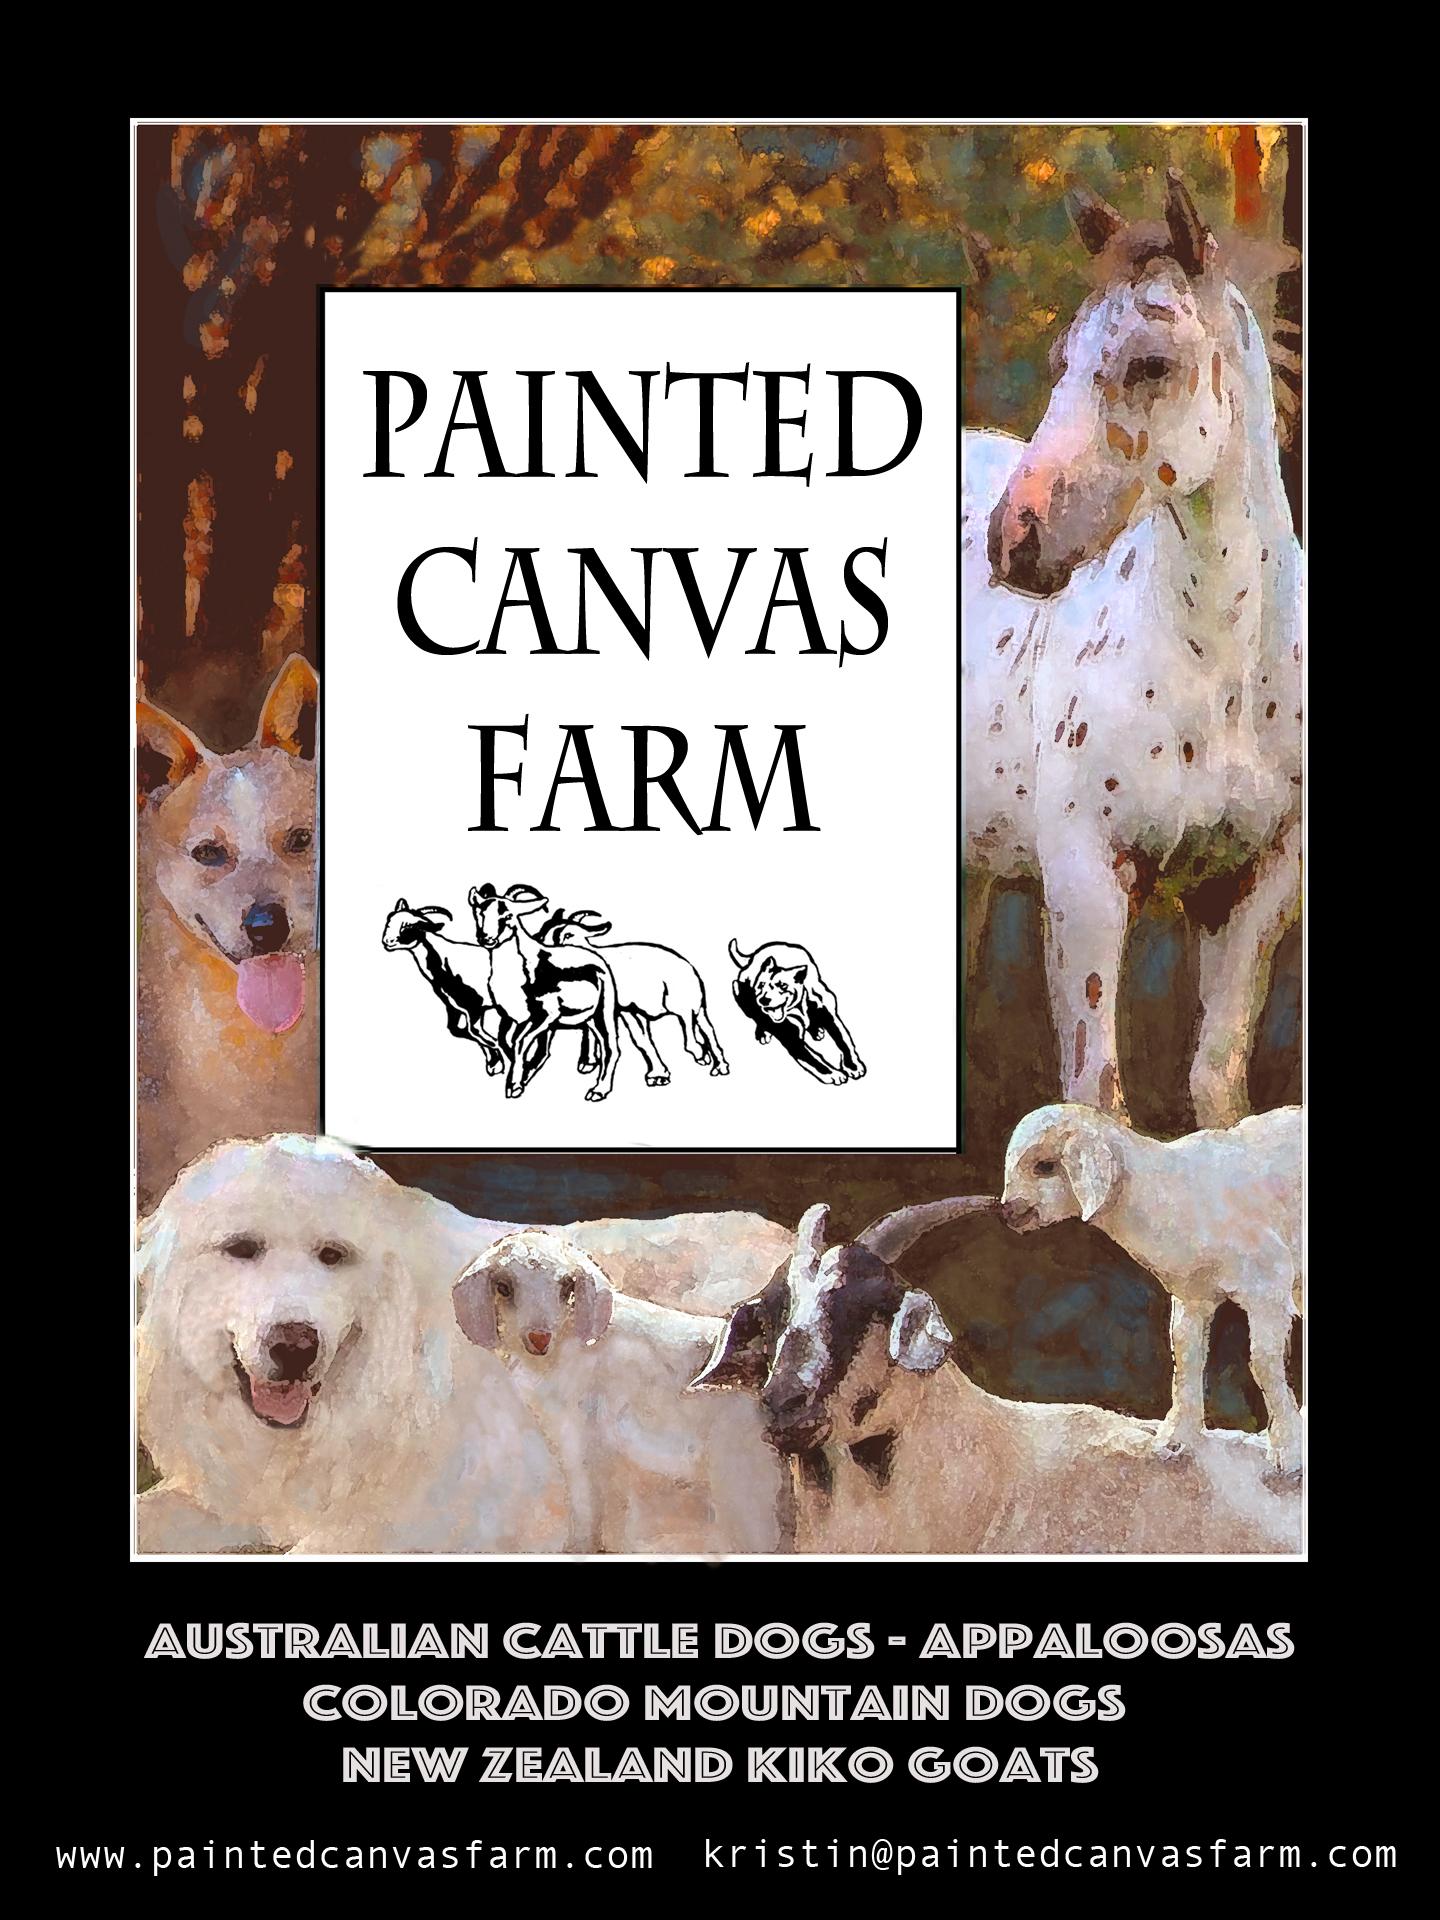 Painted Canvas Farm, MISSOURI Kristin Roberson  538 North Highway F, Lamar, MO -- 64759 417- 214- 4825    Kristin@PaintedCanvasFarms.com -- www.PaintedCanvasFarm.com Australian Cattle Dogs, Colorado Mountain Dogs, New Zealand Kiko Goats, Appaloosa Horses